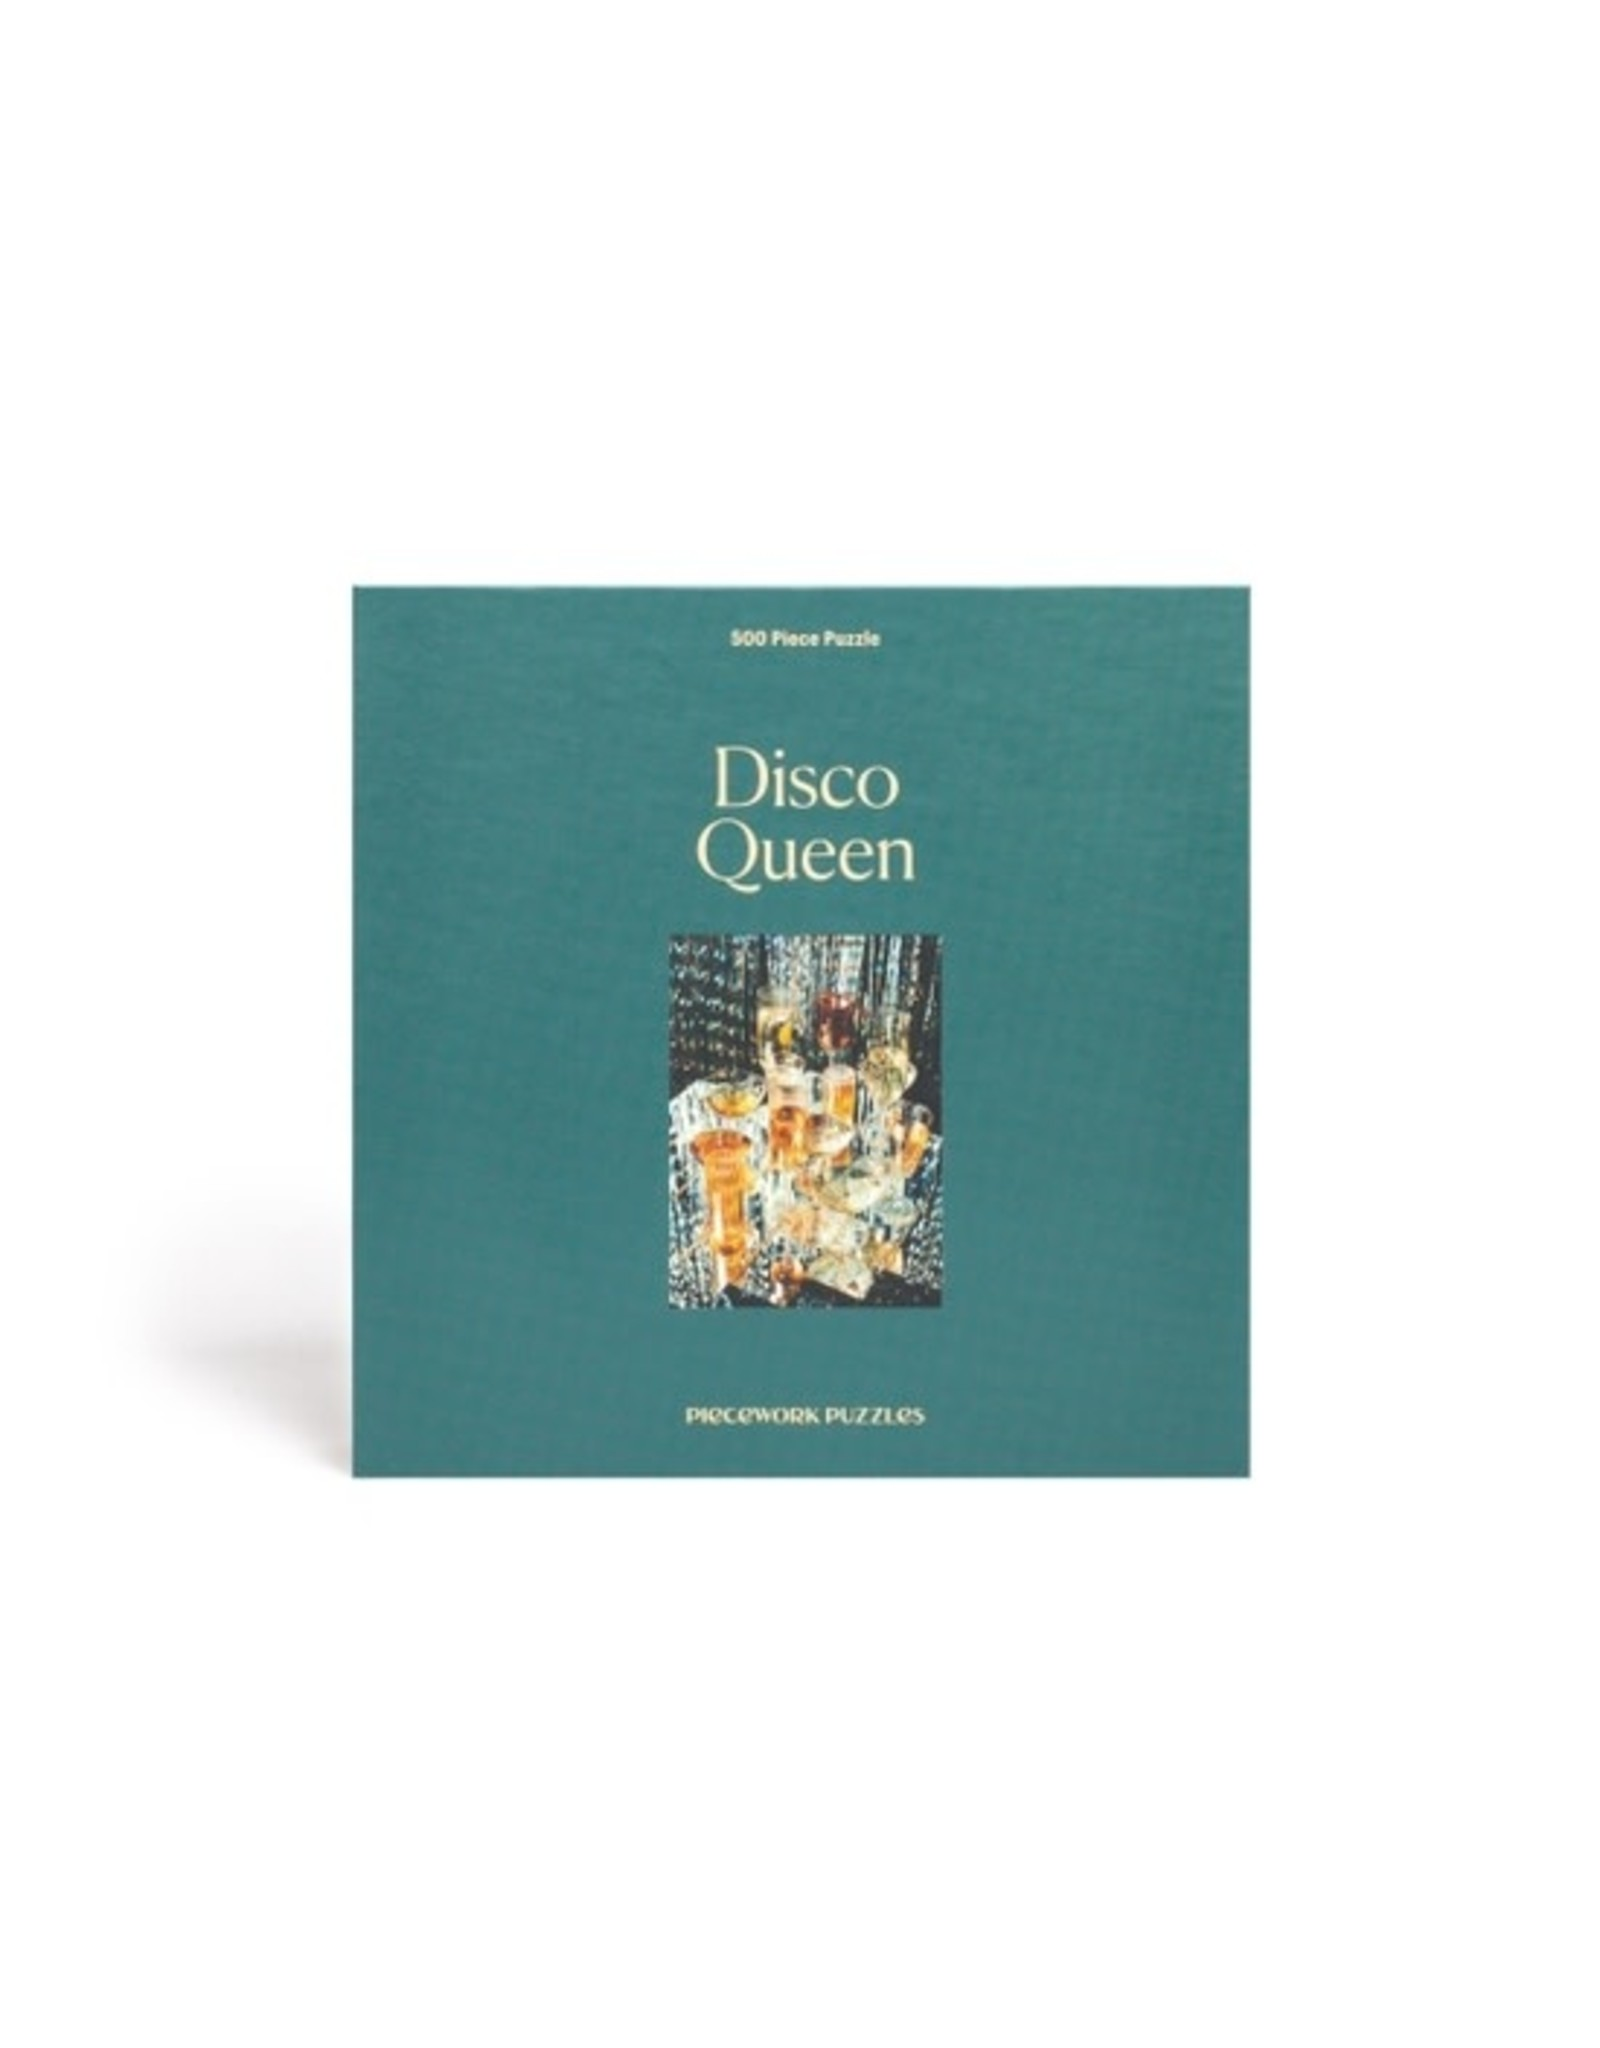 Piecework Puzzles Disco Queen - 500 Piece Puzzle